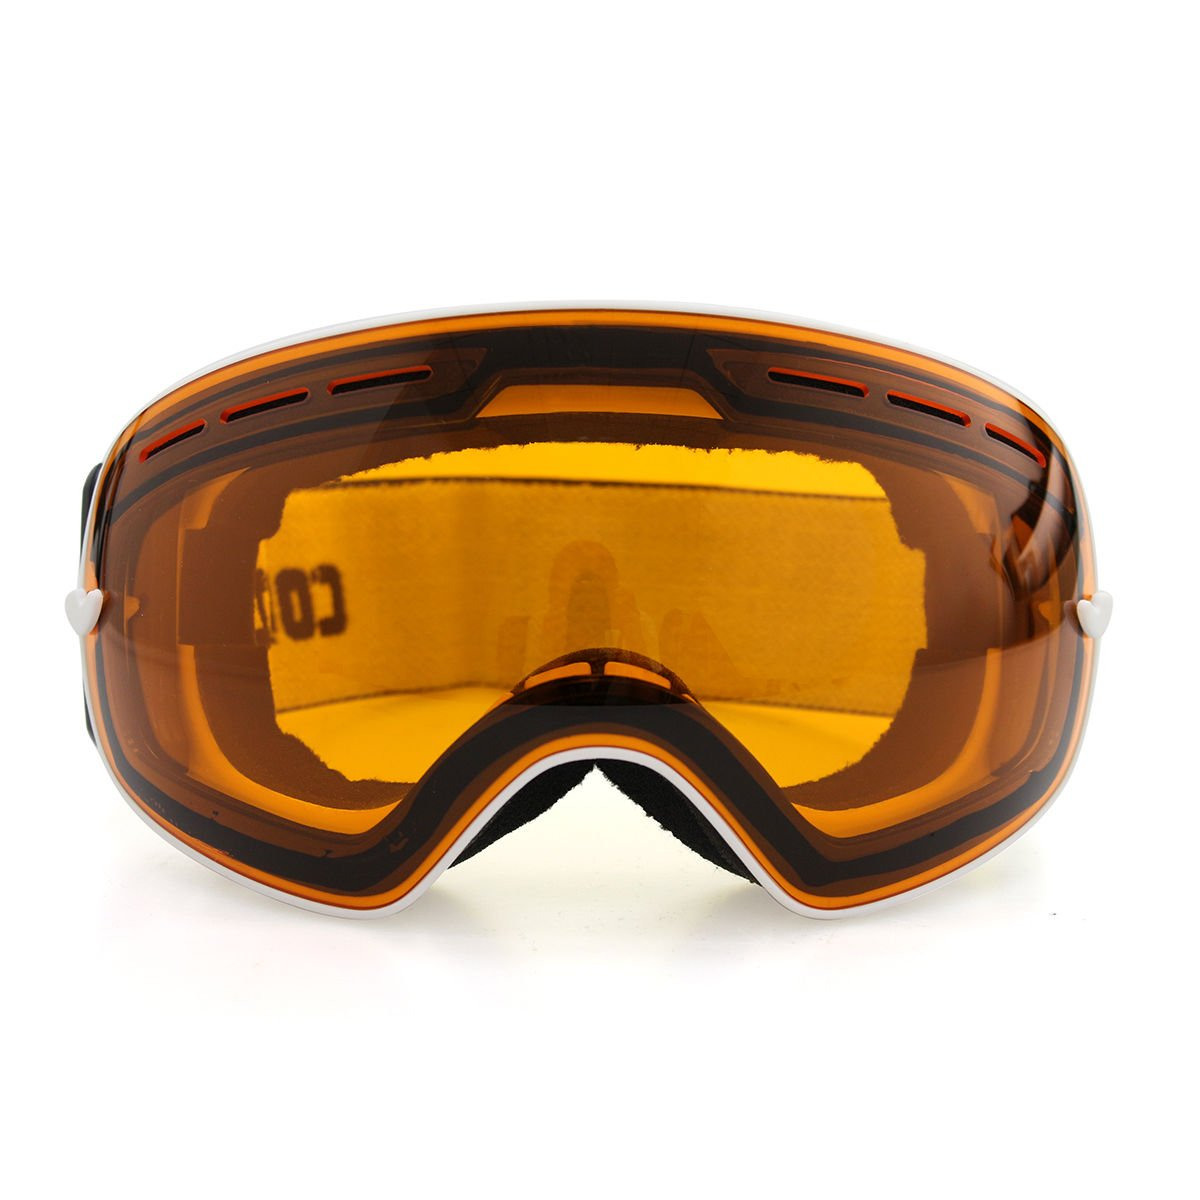 Lenseオレンジゴーグルスキースノーボードゴーグル曇り止めuv400冬スポーツスキーゴーグルセット B0721N3SJ6